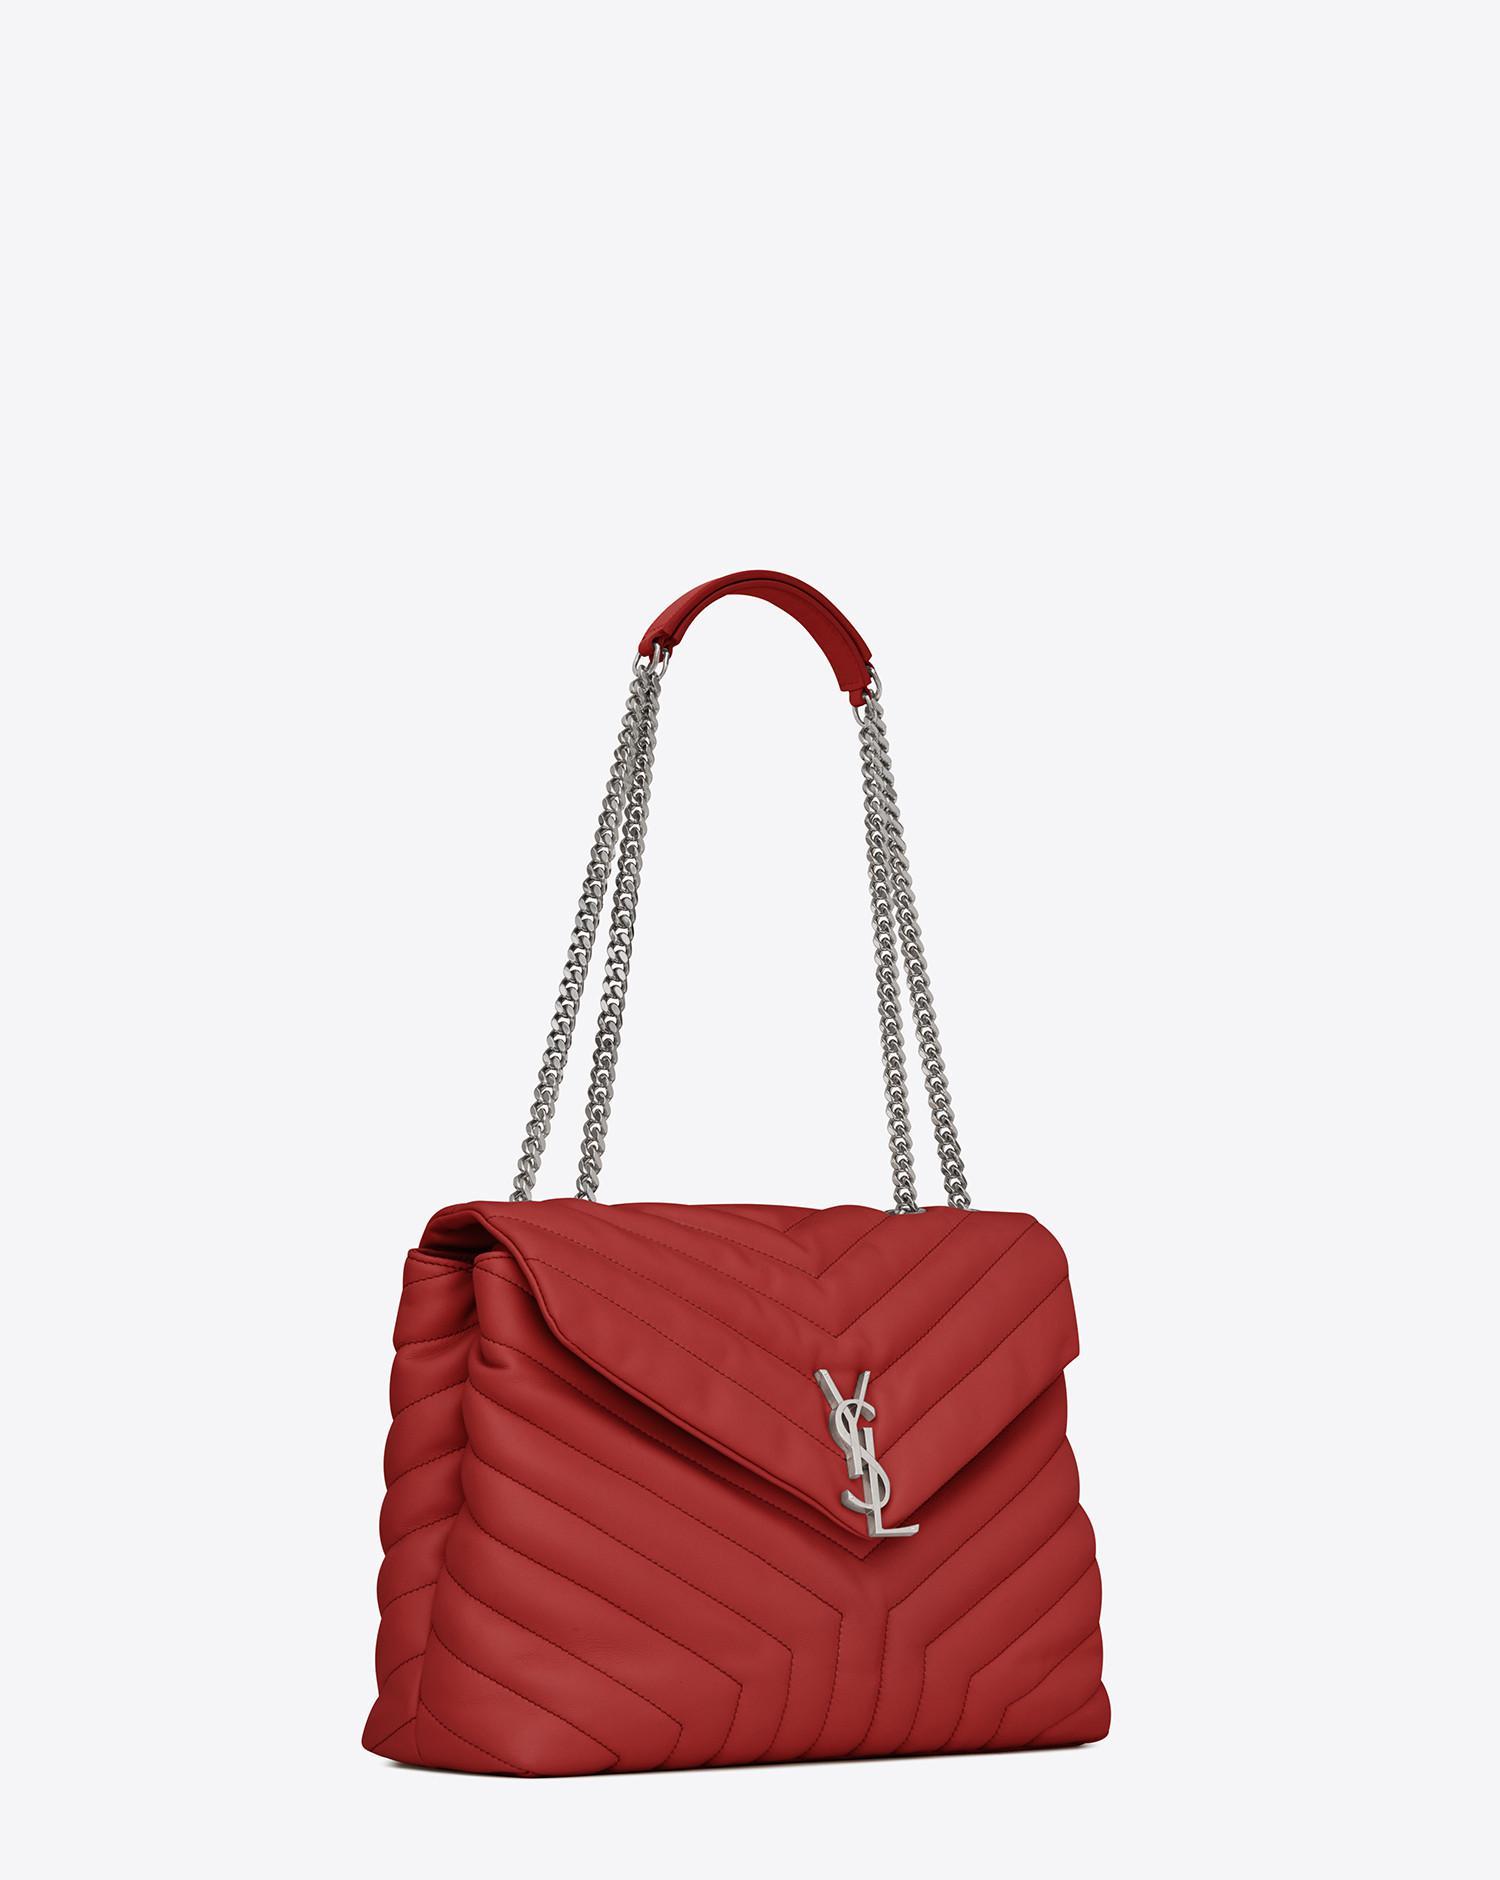 Saint Laurent Medium Loulou Monogram Chain Bag In Lipstick Red